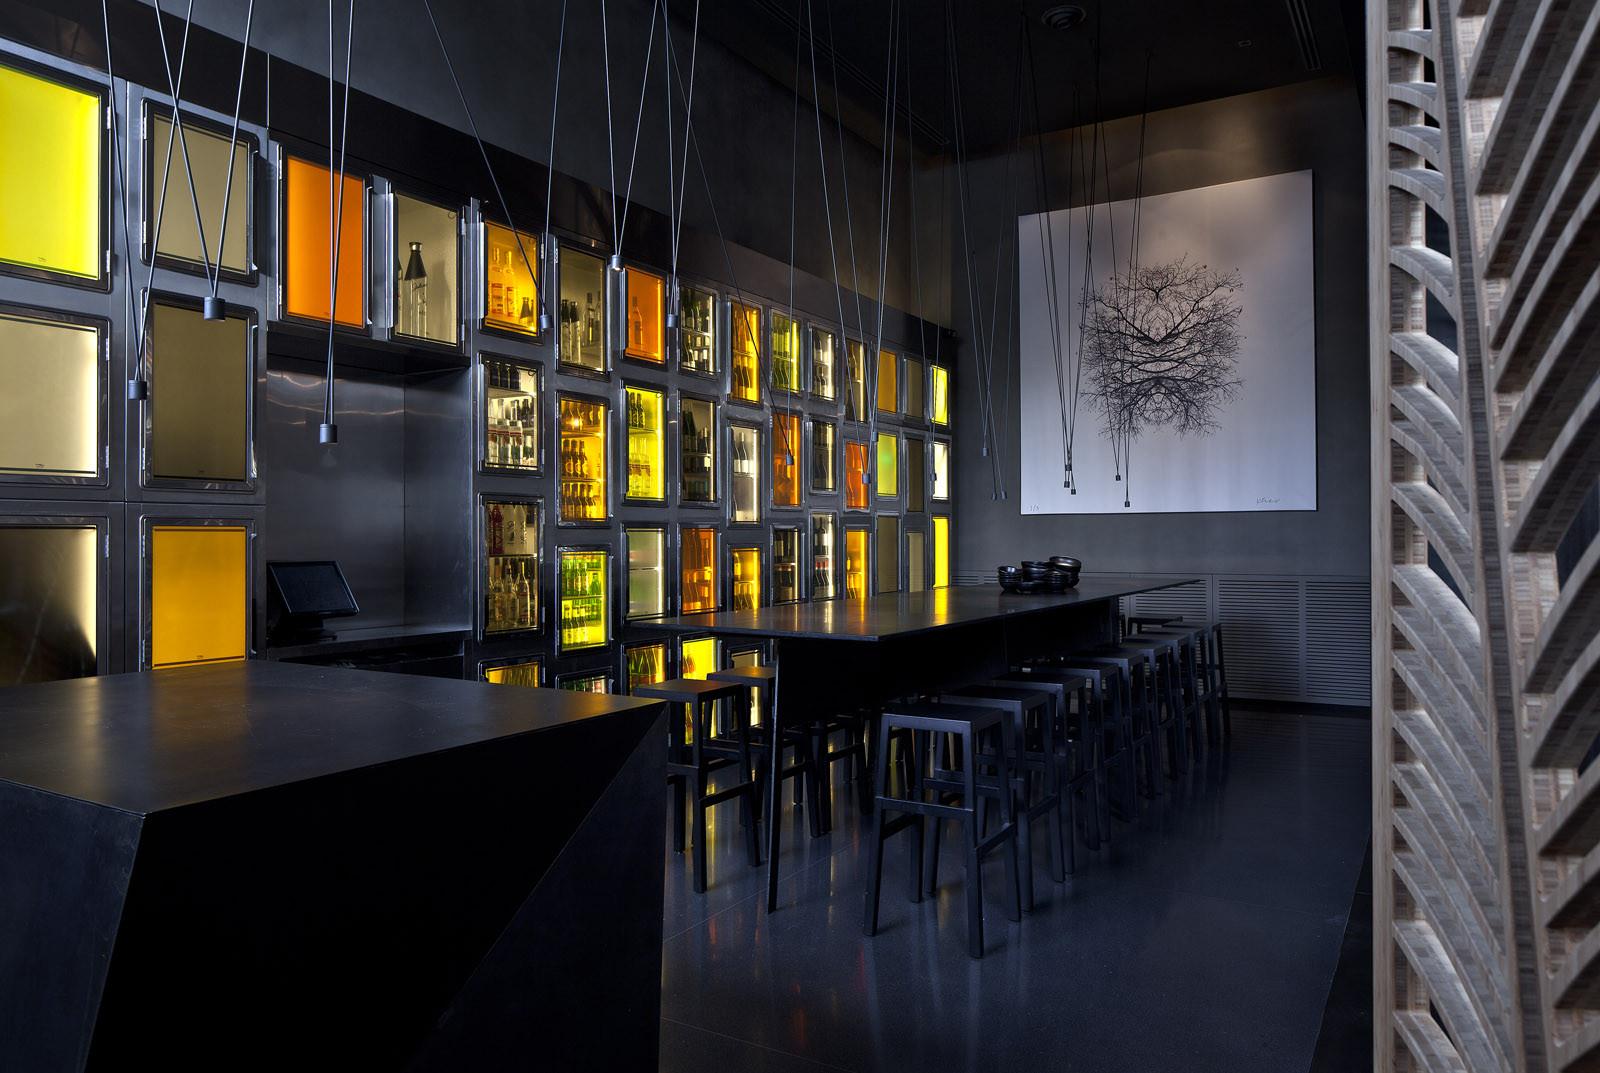 Taizu Restaurant / Pitsou Kedem Architects + Baranowitz-Amit Design Studio